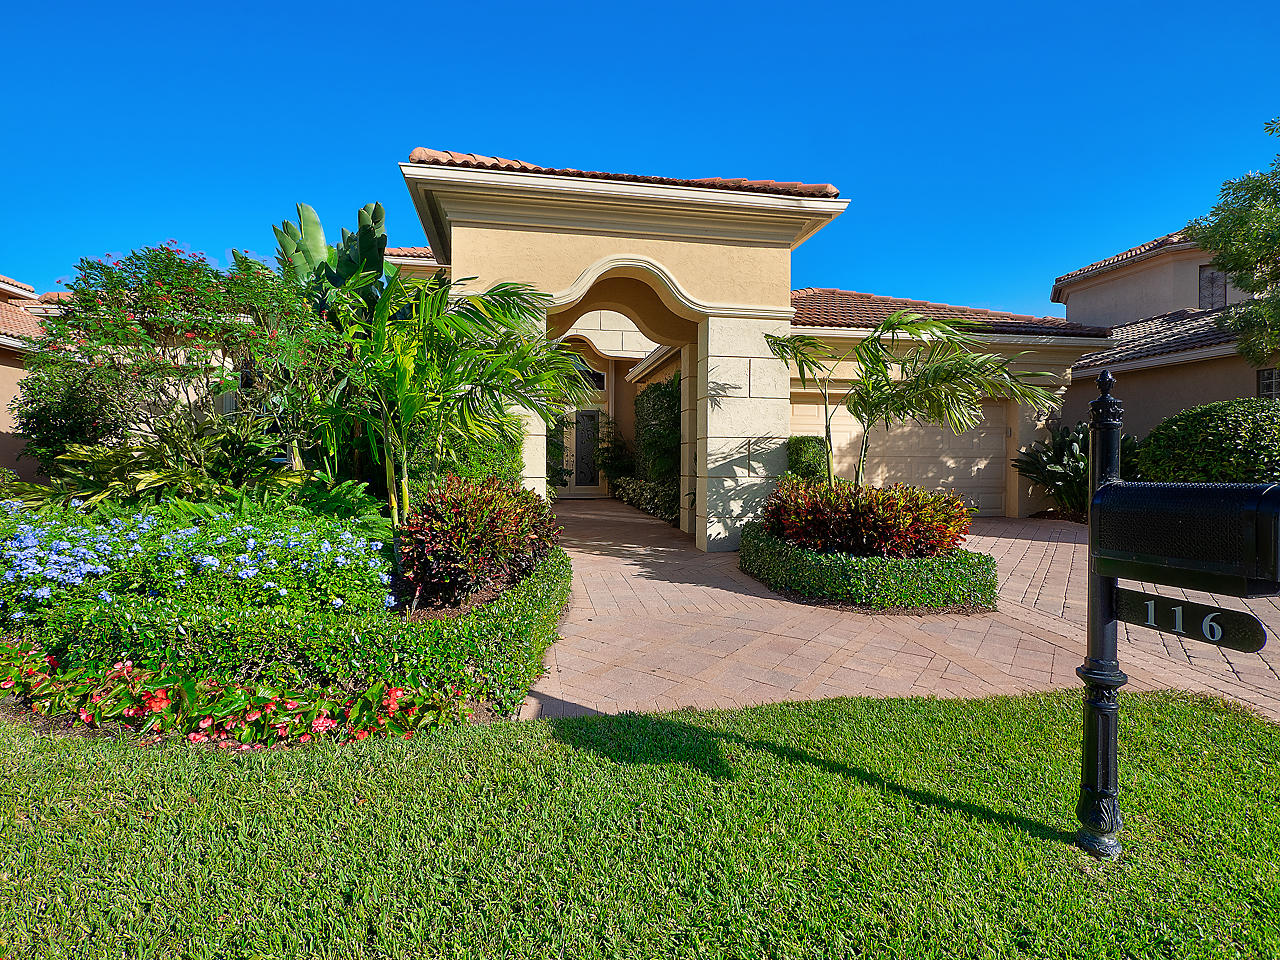 116 Sunesta Cove Drive, Palm Beach Gardens, Florida 33418, 3 Bedrooms Bedrooms, ,3.1 BathroomsBathrooms,A,Single family,Sunesta Cove,RX-10582554